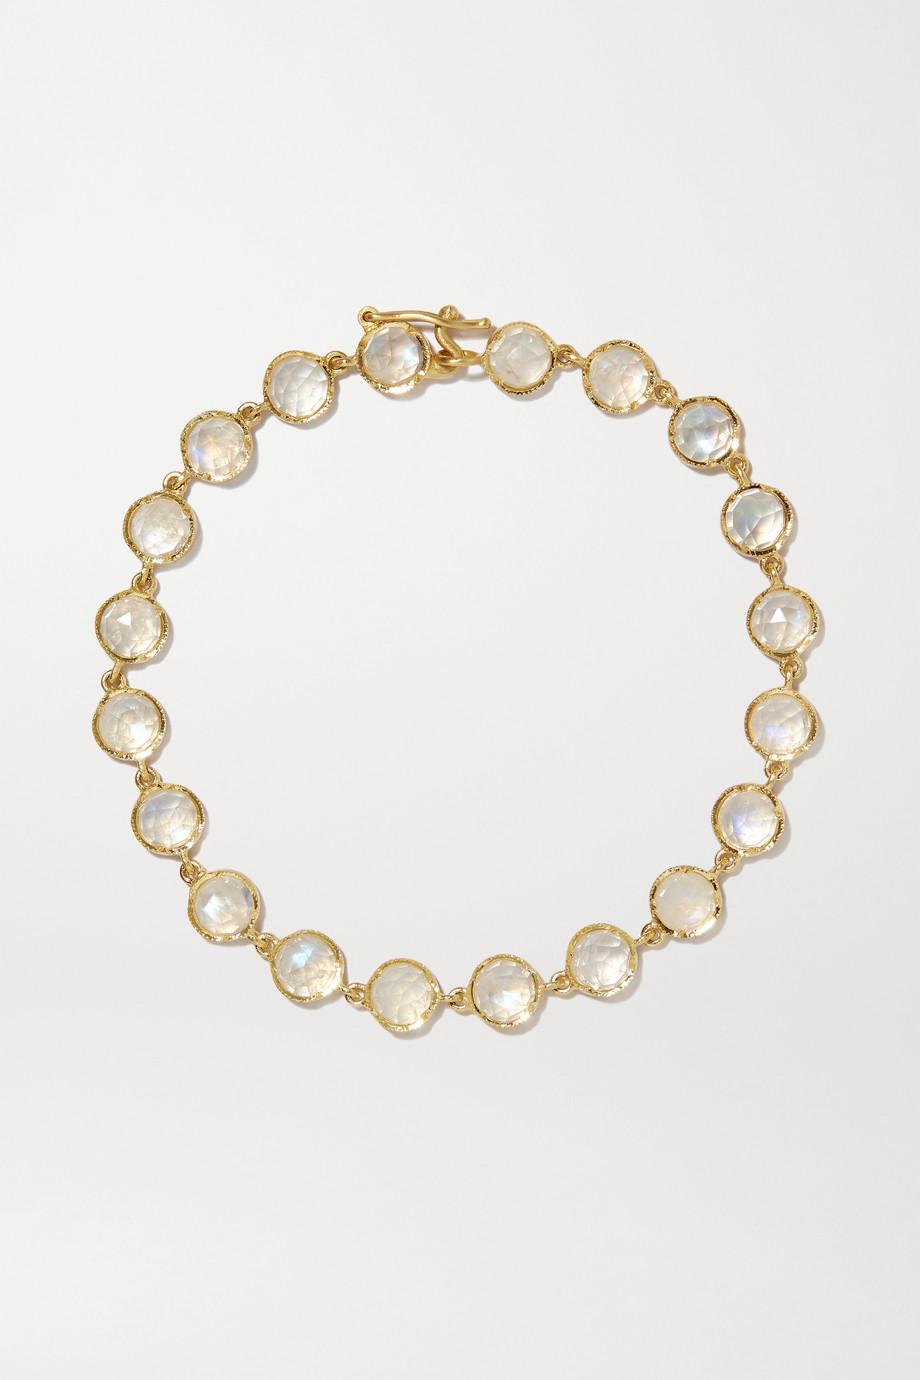 Irene Neuwirth Classic 18-karat gold moonstone bracelet